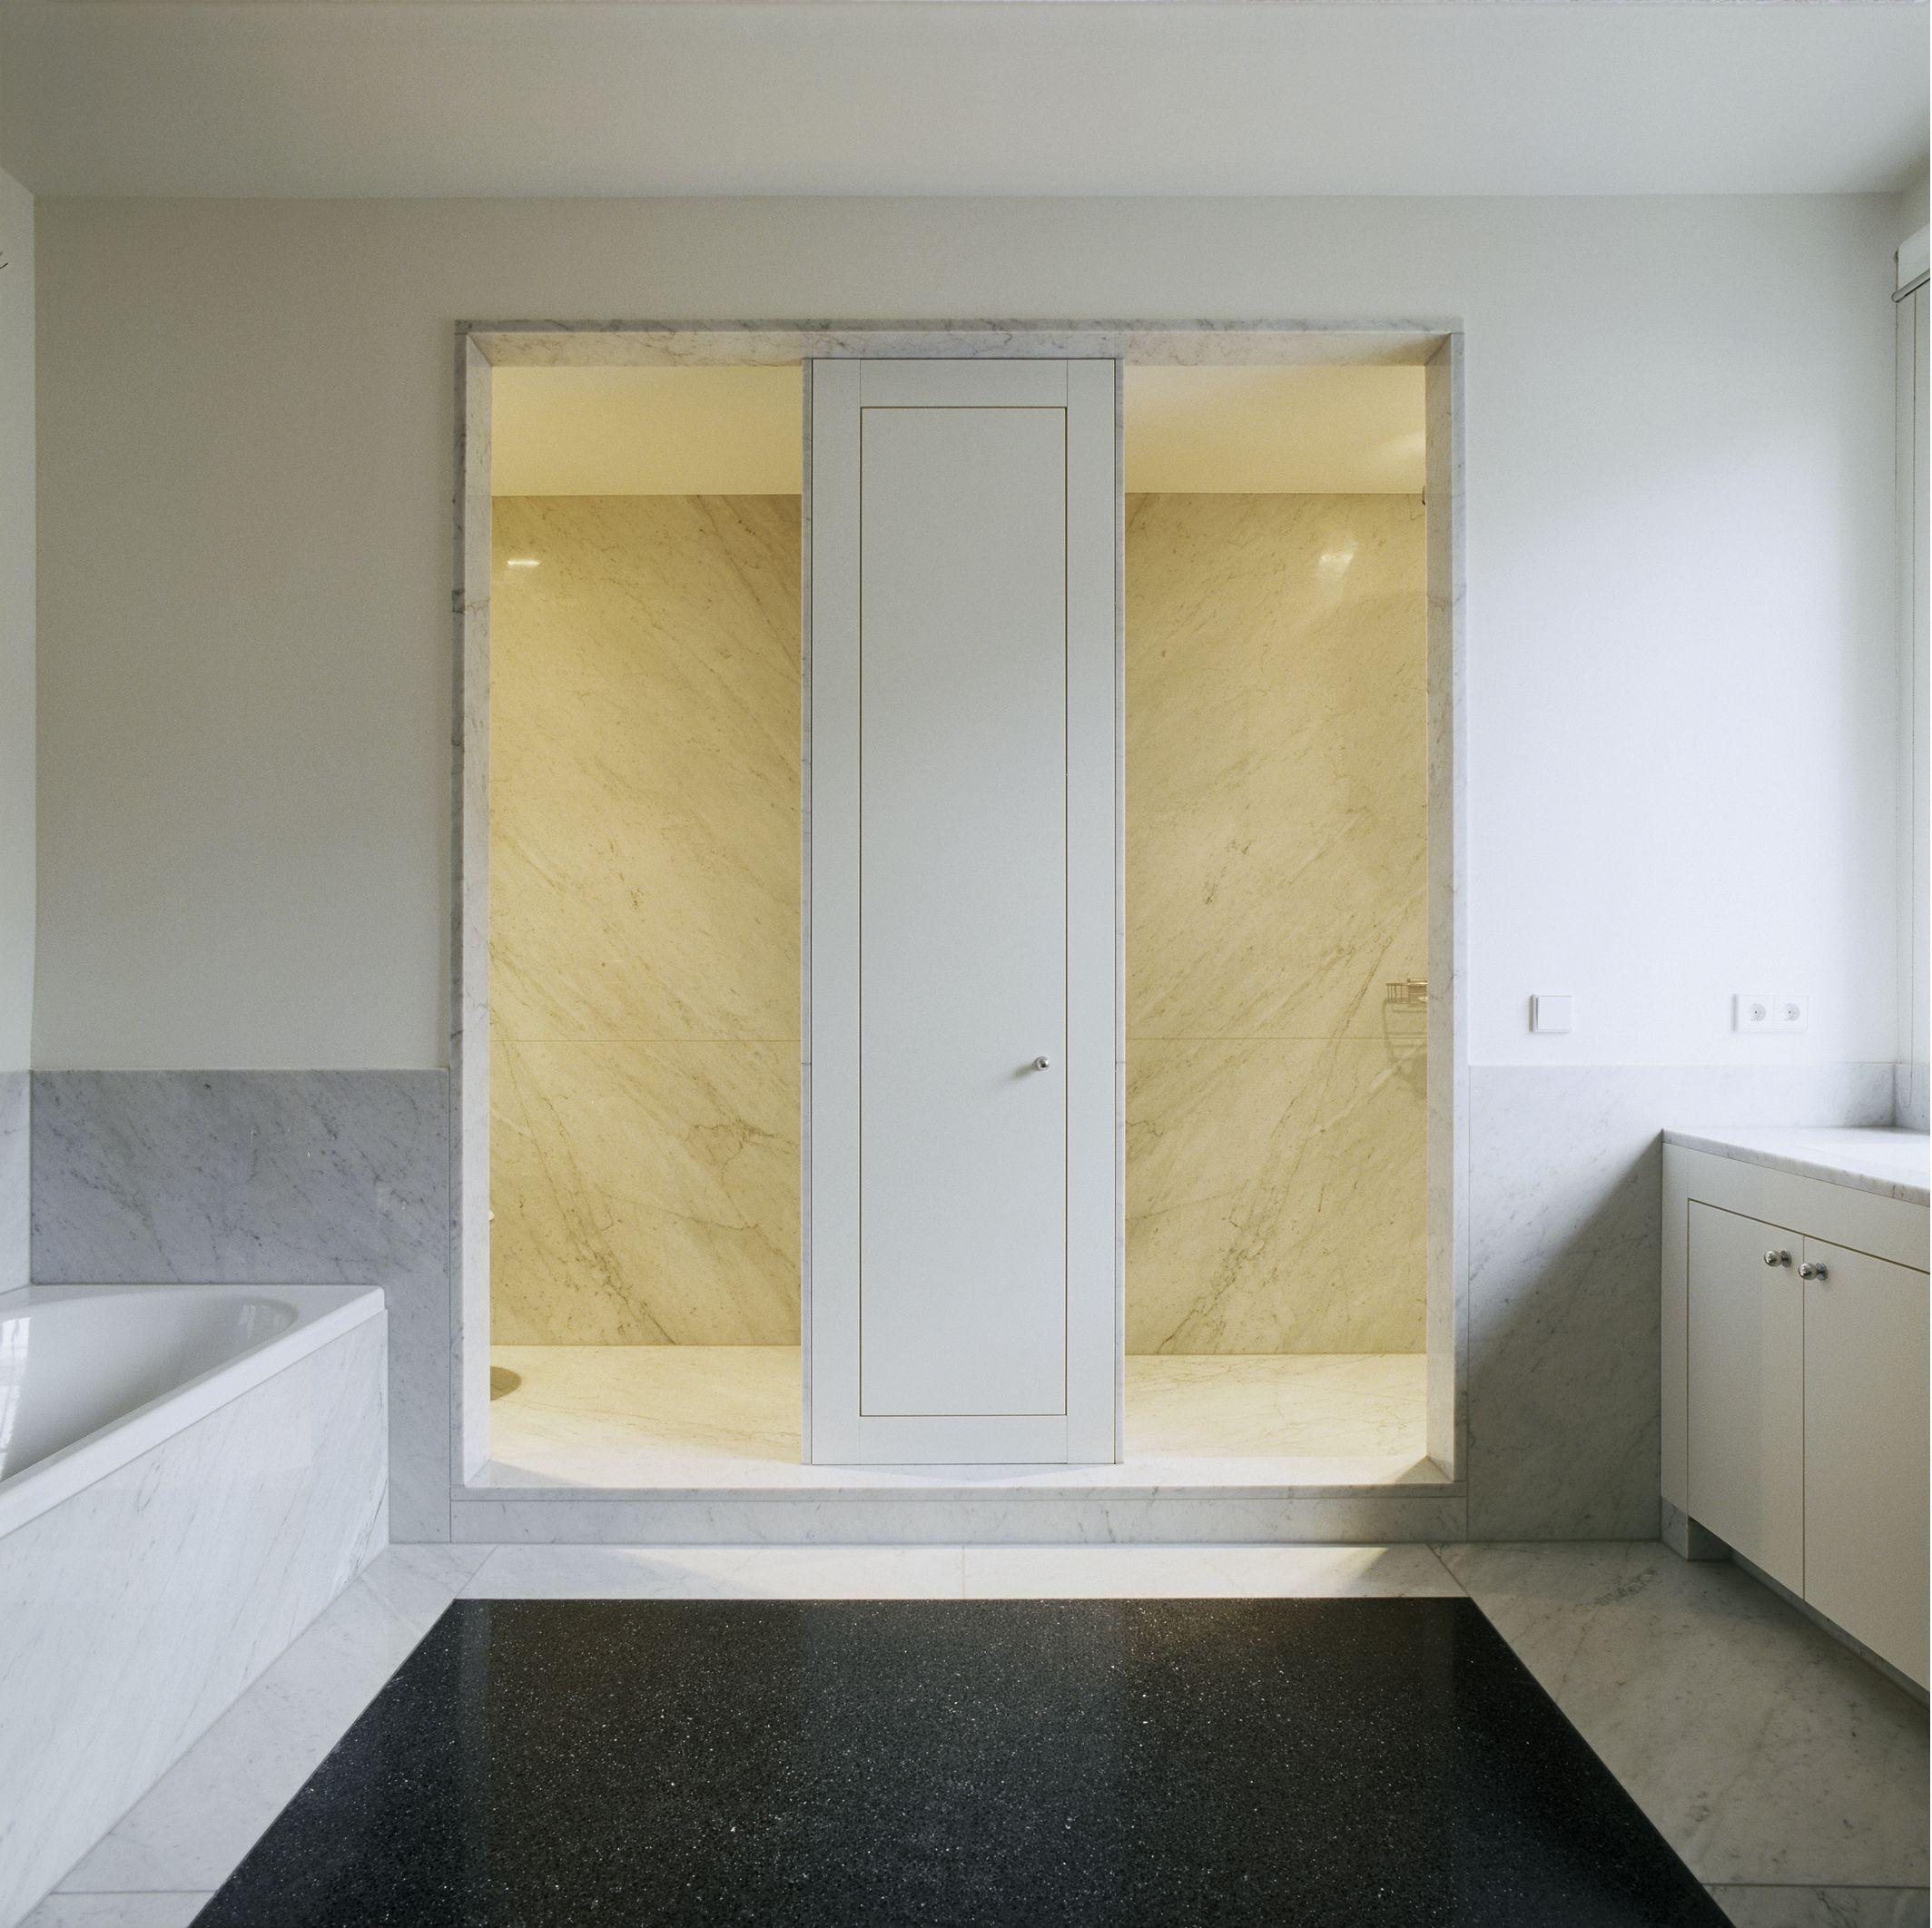 Terrazzo trifft auf Carrara Marmor im Badezimmer. #terrazzo ...